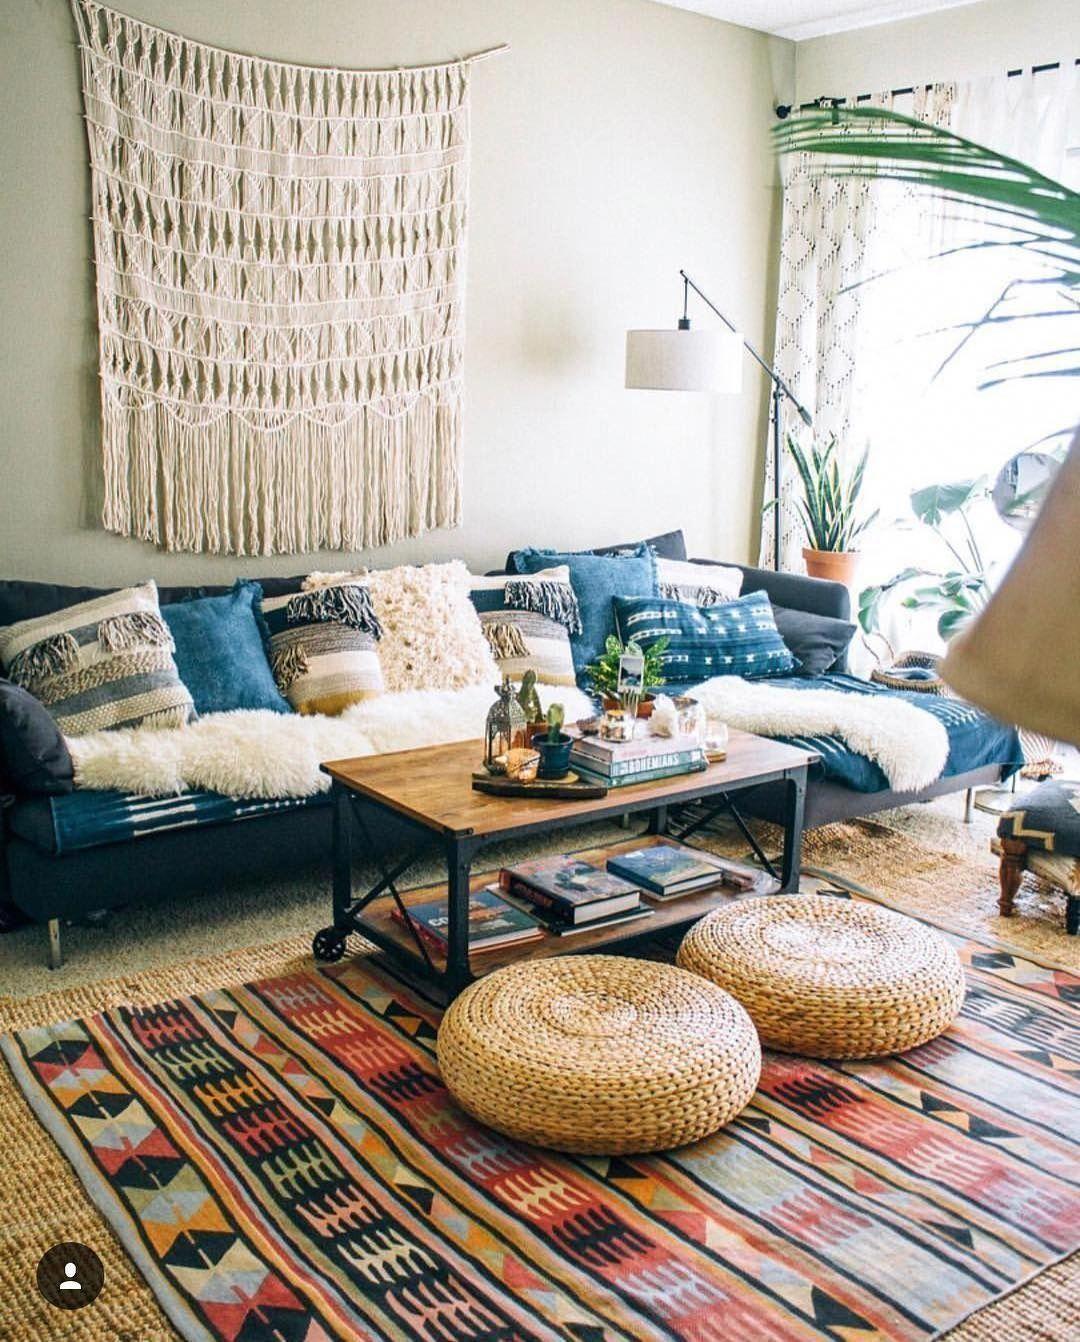 Bohemian Interior Design You Must Know Design Rustic Scandinavian Dining Chic Modern Luxury Vinta Minimalist Living Room Bohemian Living Room Hippie Interior